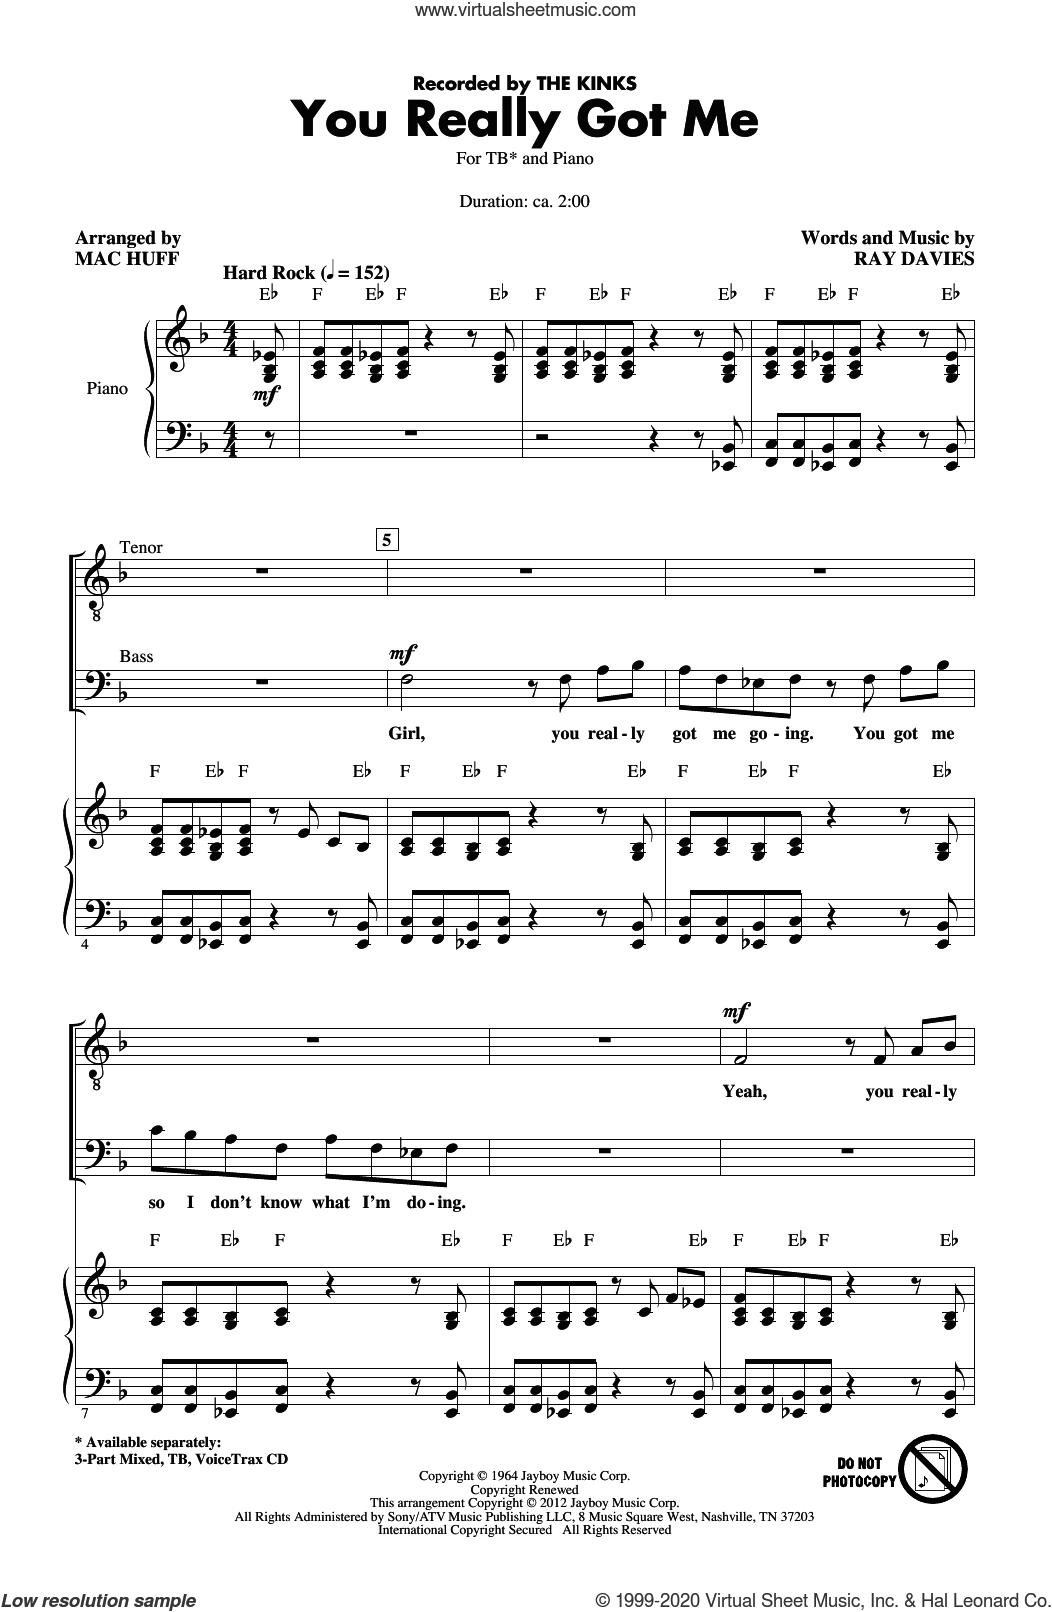 You Really Got Me (arr. Mac Huff) sheet music for choir (TB: tenor, bass) by The Kinks, Mac Huff and Ray Davies, intermediate skill level